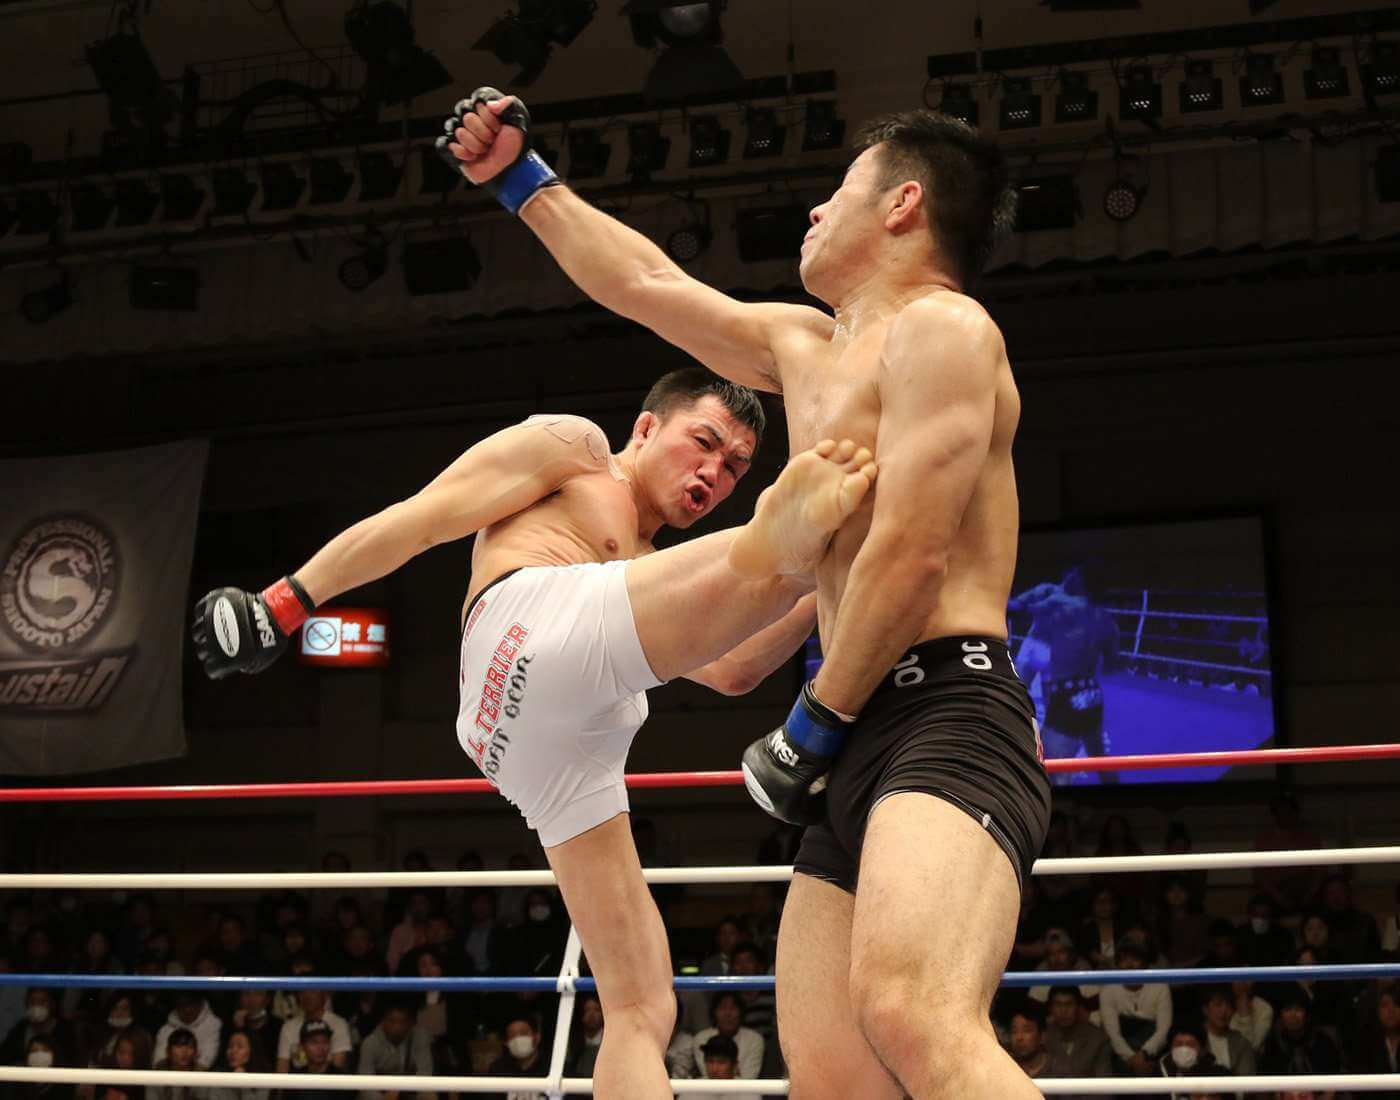 Kickboxing combat sports